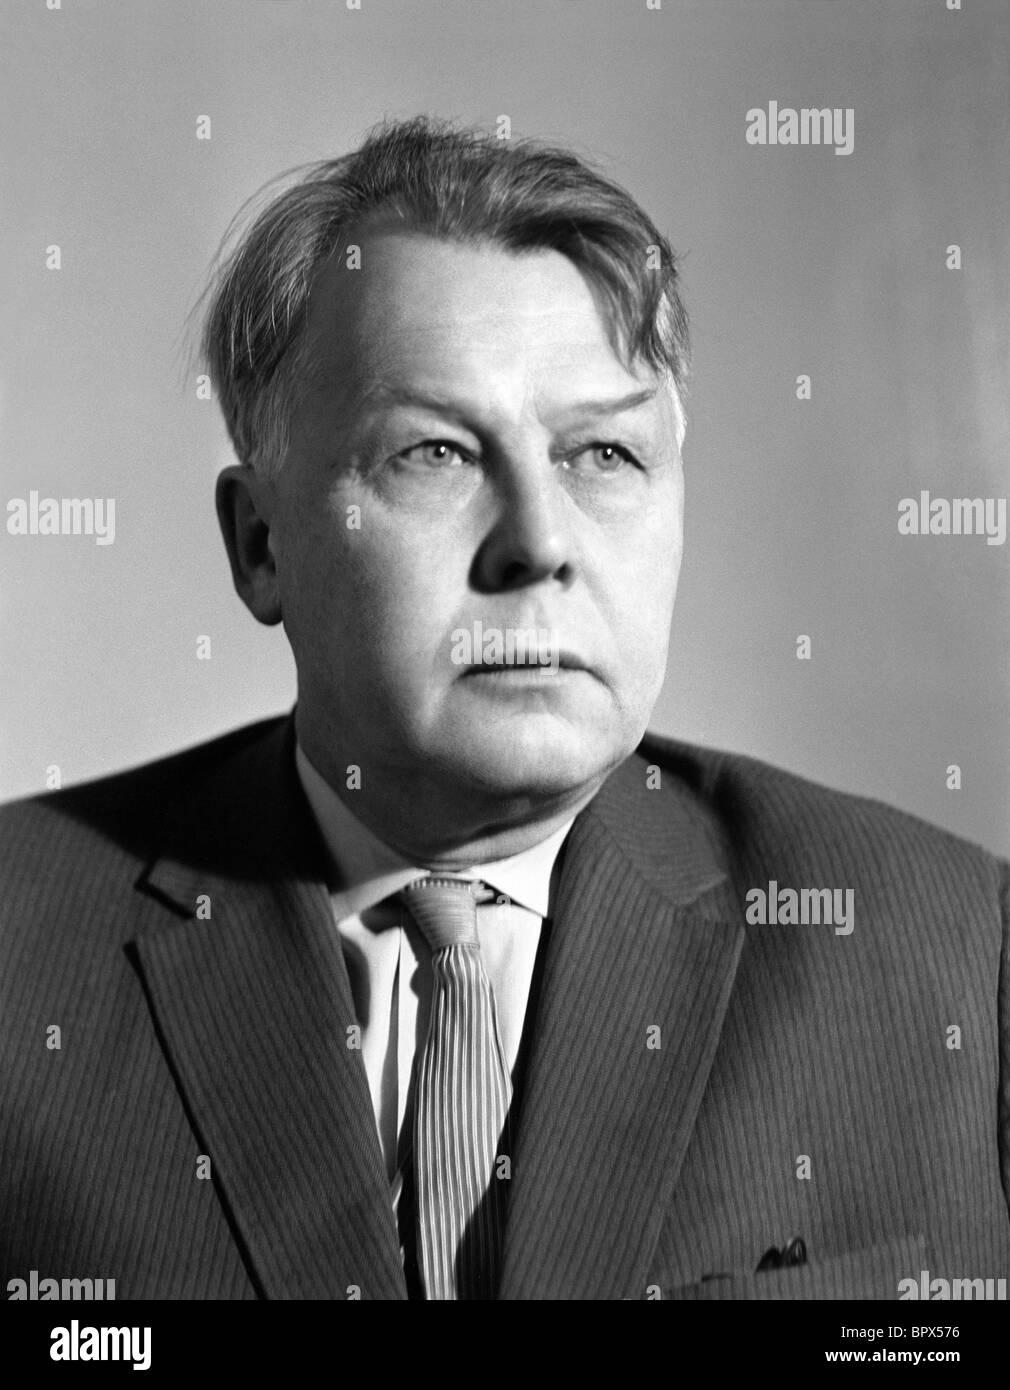 A. T. Tvardovsky, Vasily Terkin: a brief summary. Main characters. Date of writing 24